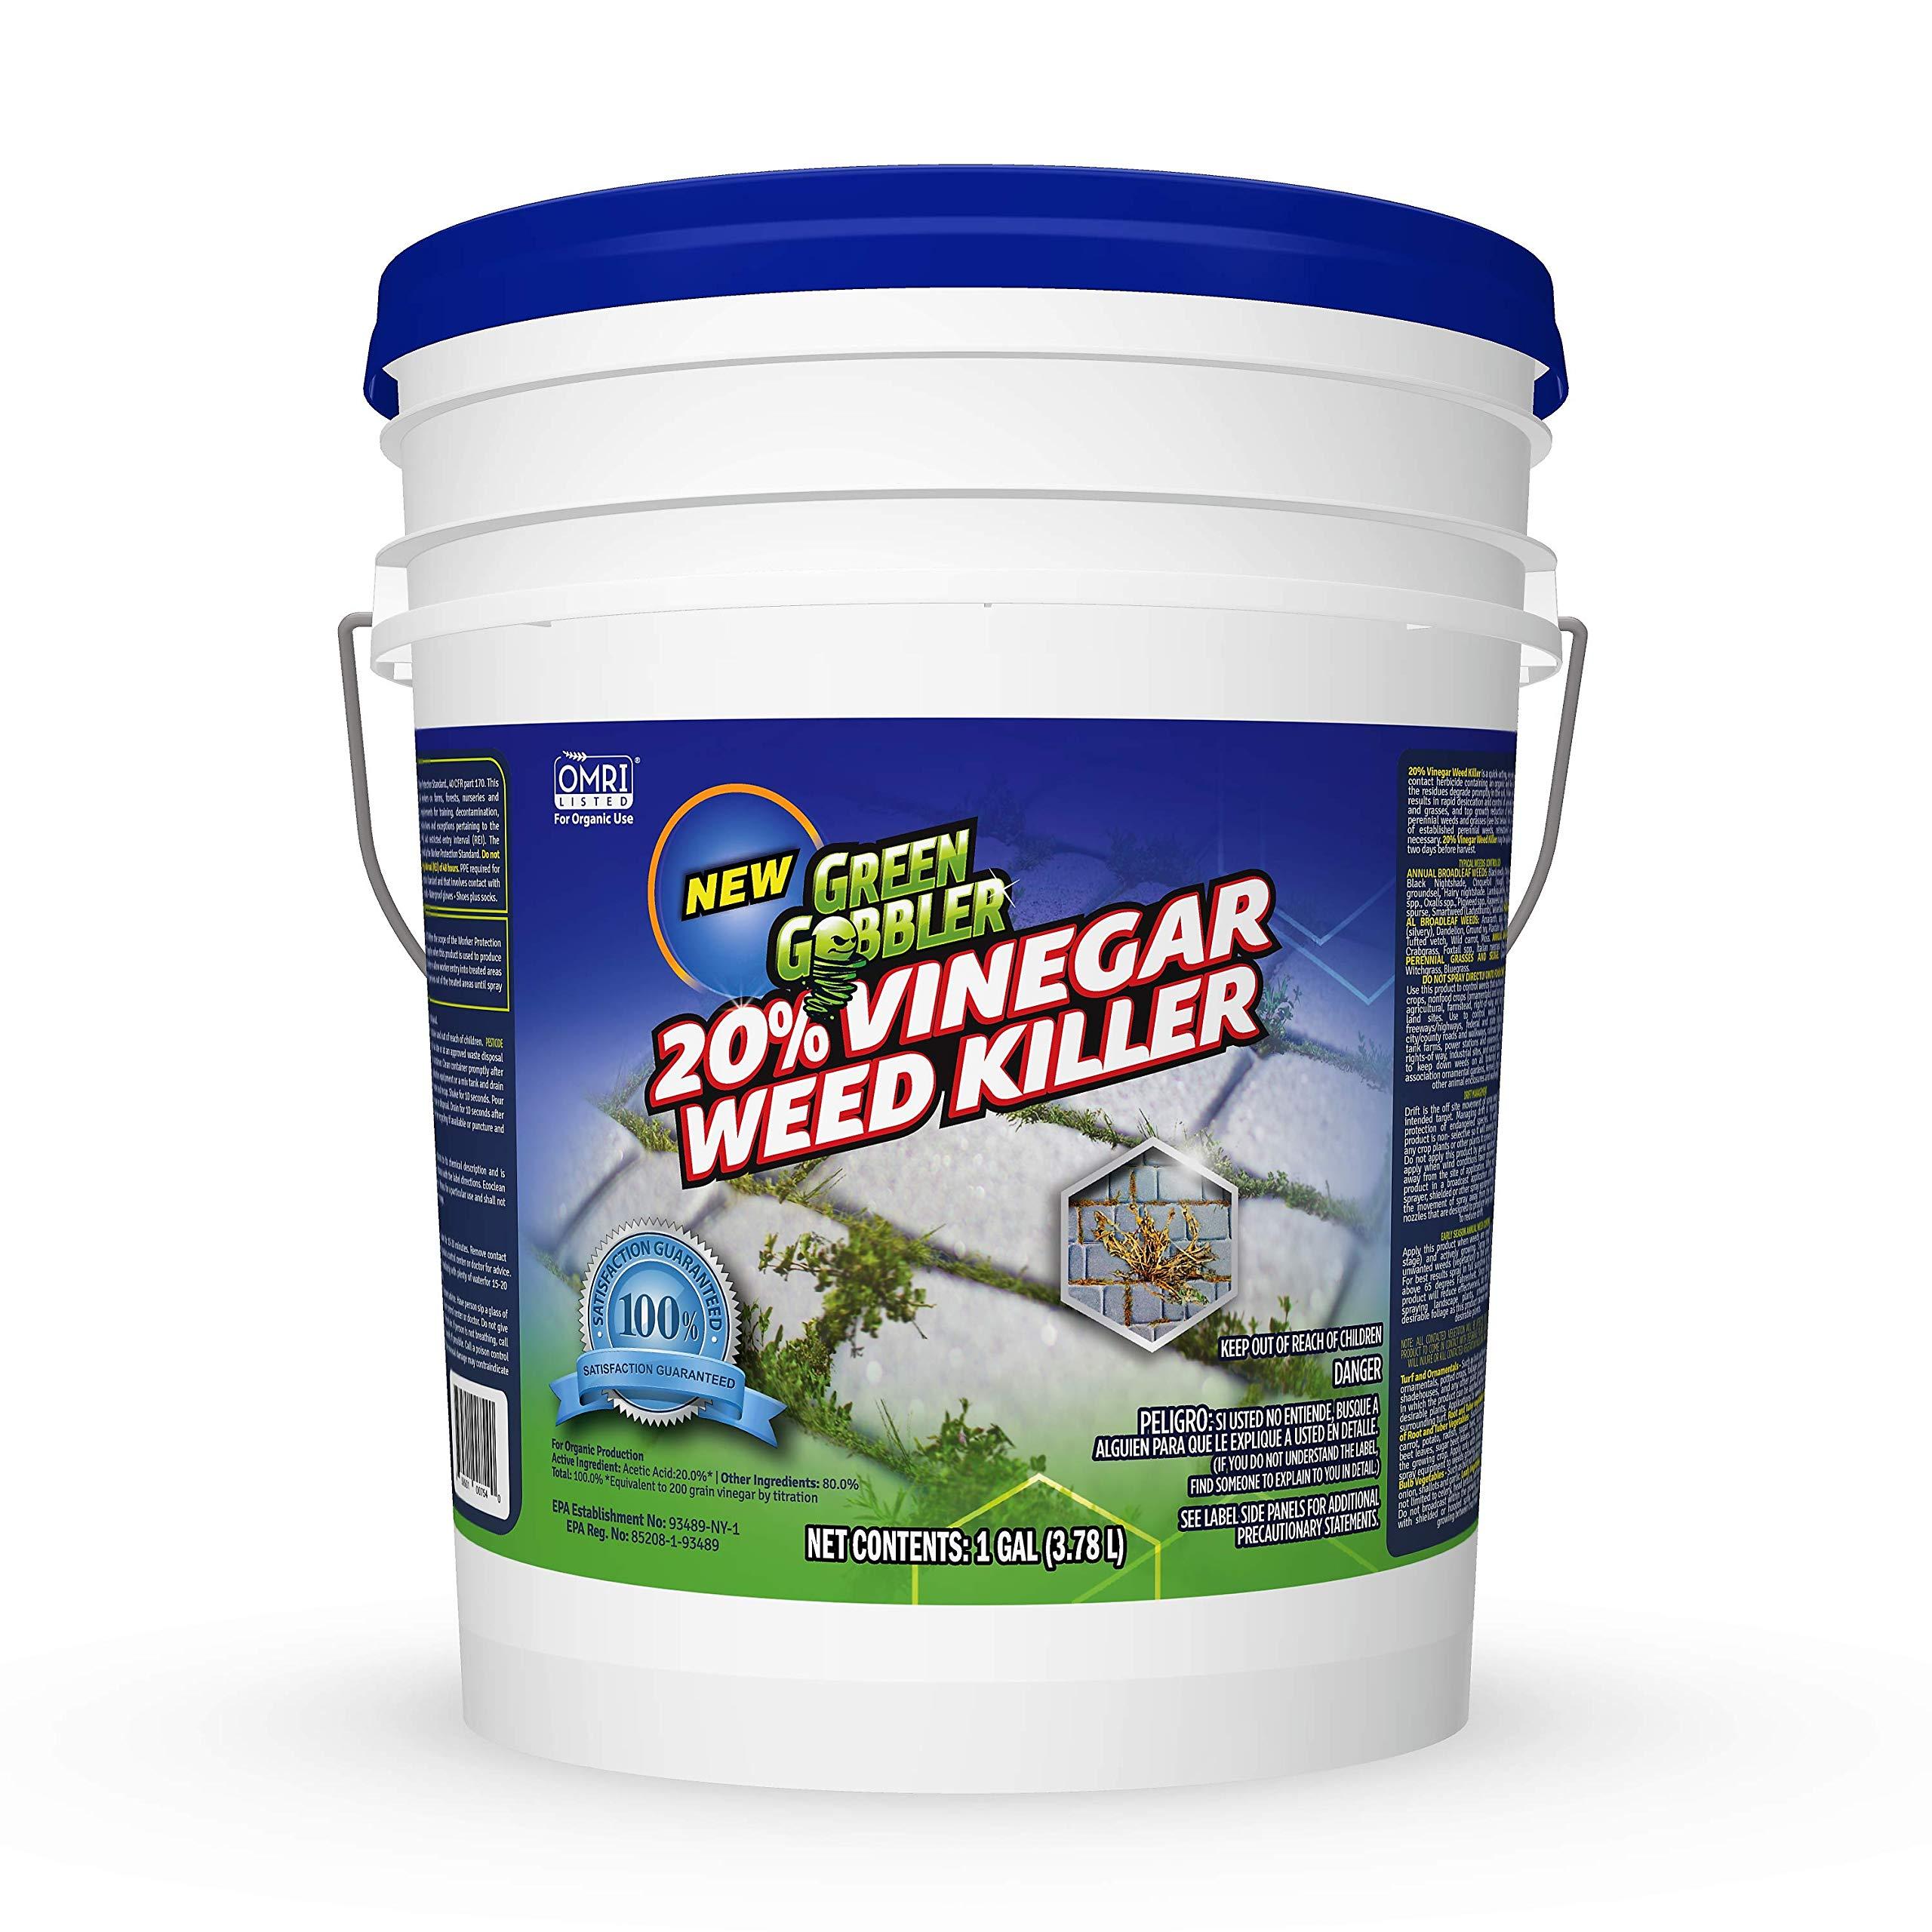 Green Gobbler 20% Horticultural Vinegar Weed Killer | Herbicide | Natural Weed Killer | Organic Weed Killer (5 Gallon Pail) by Green Gobbler